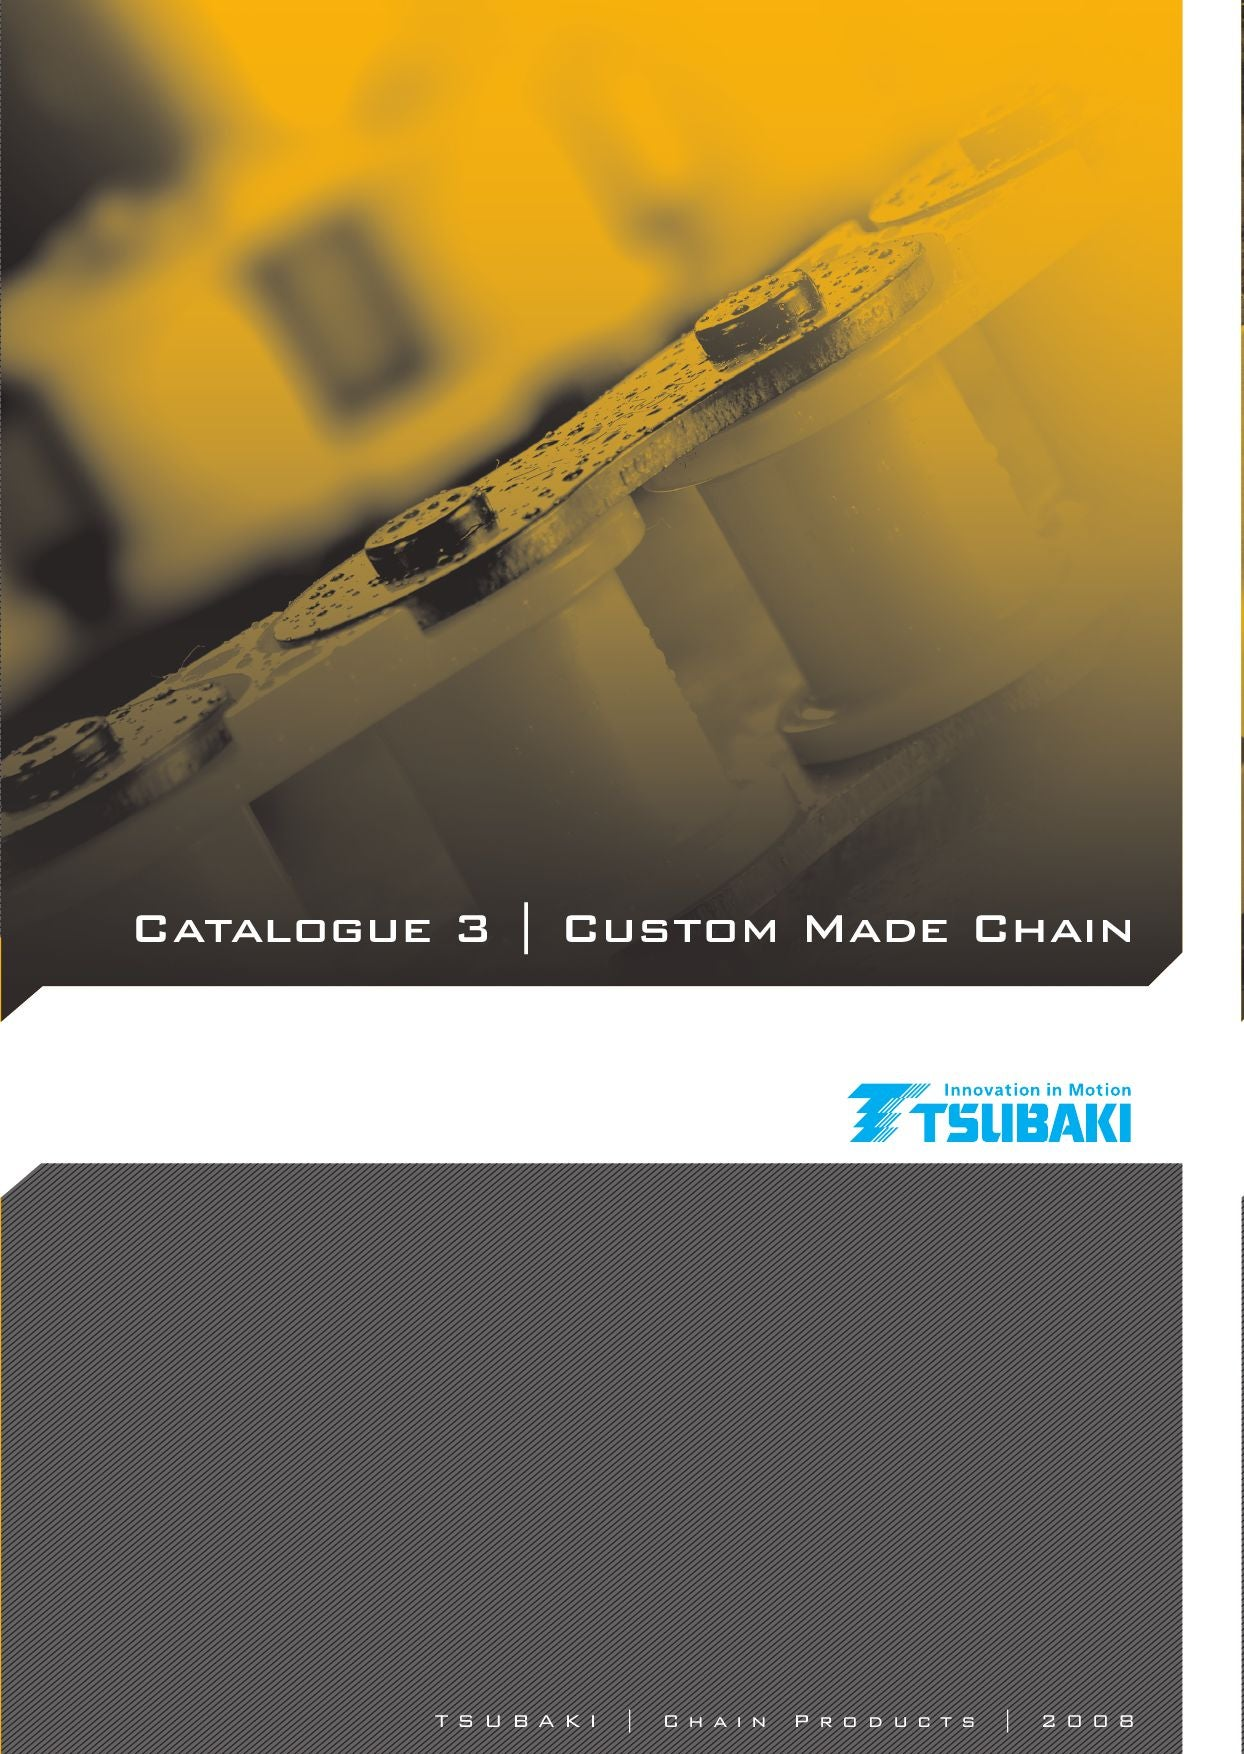 Tsubaki Large Size Conveyor Chain Catalogue by Tsubakimoto